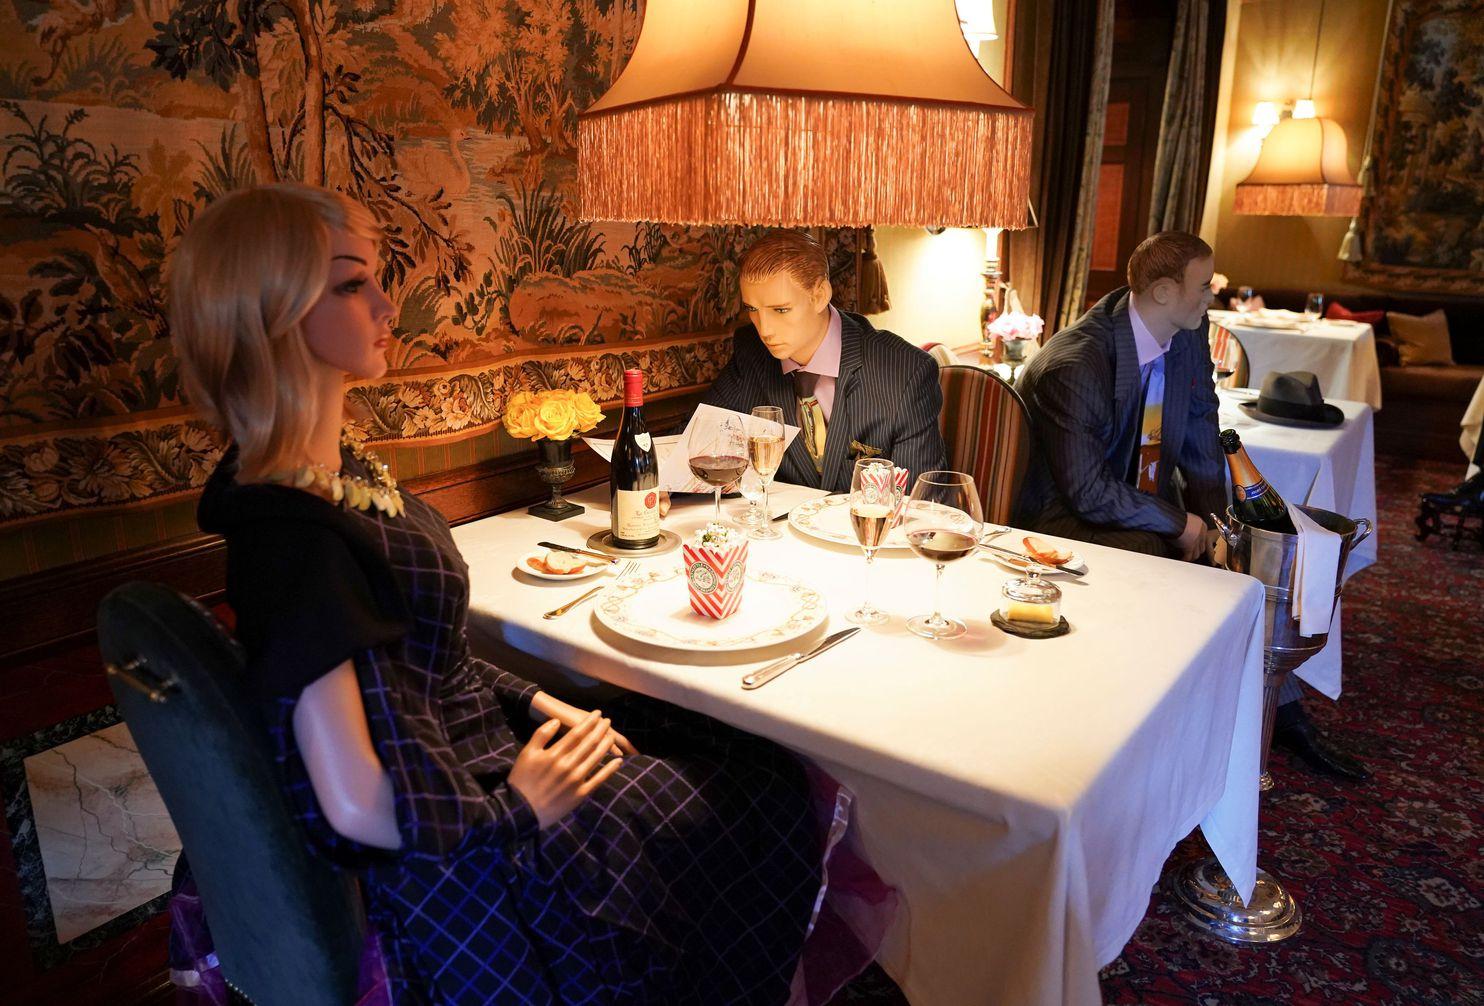 Creative Ways Restaurants Are Enforcing Social Distancing